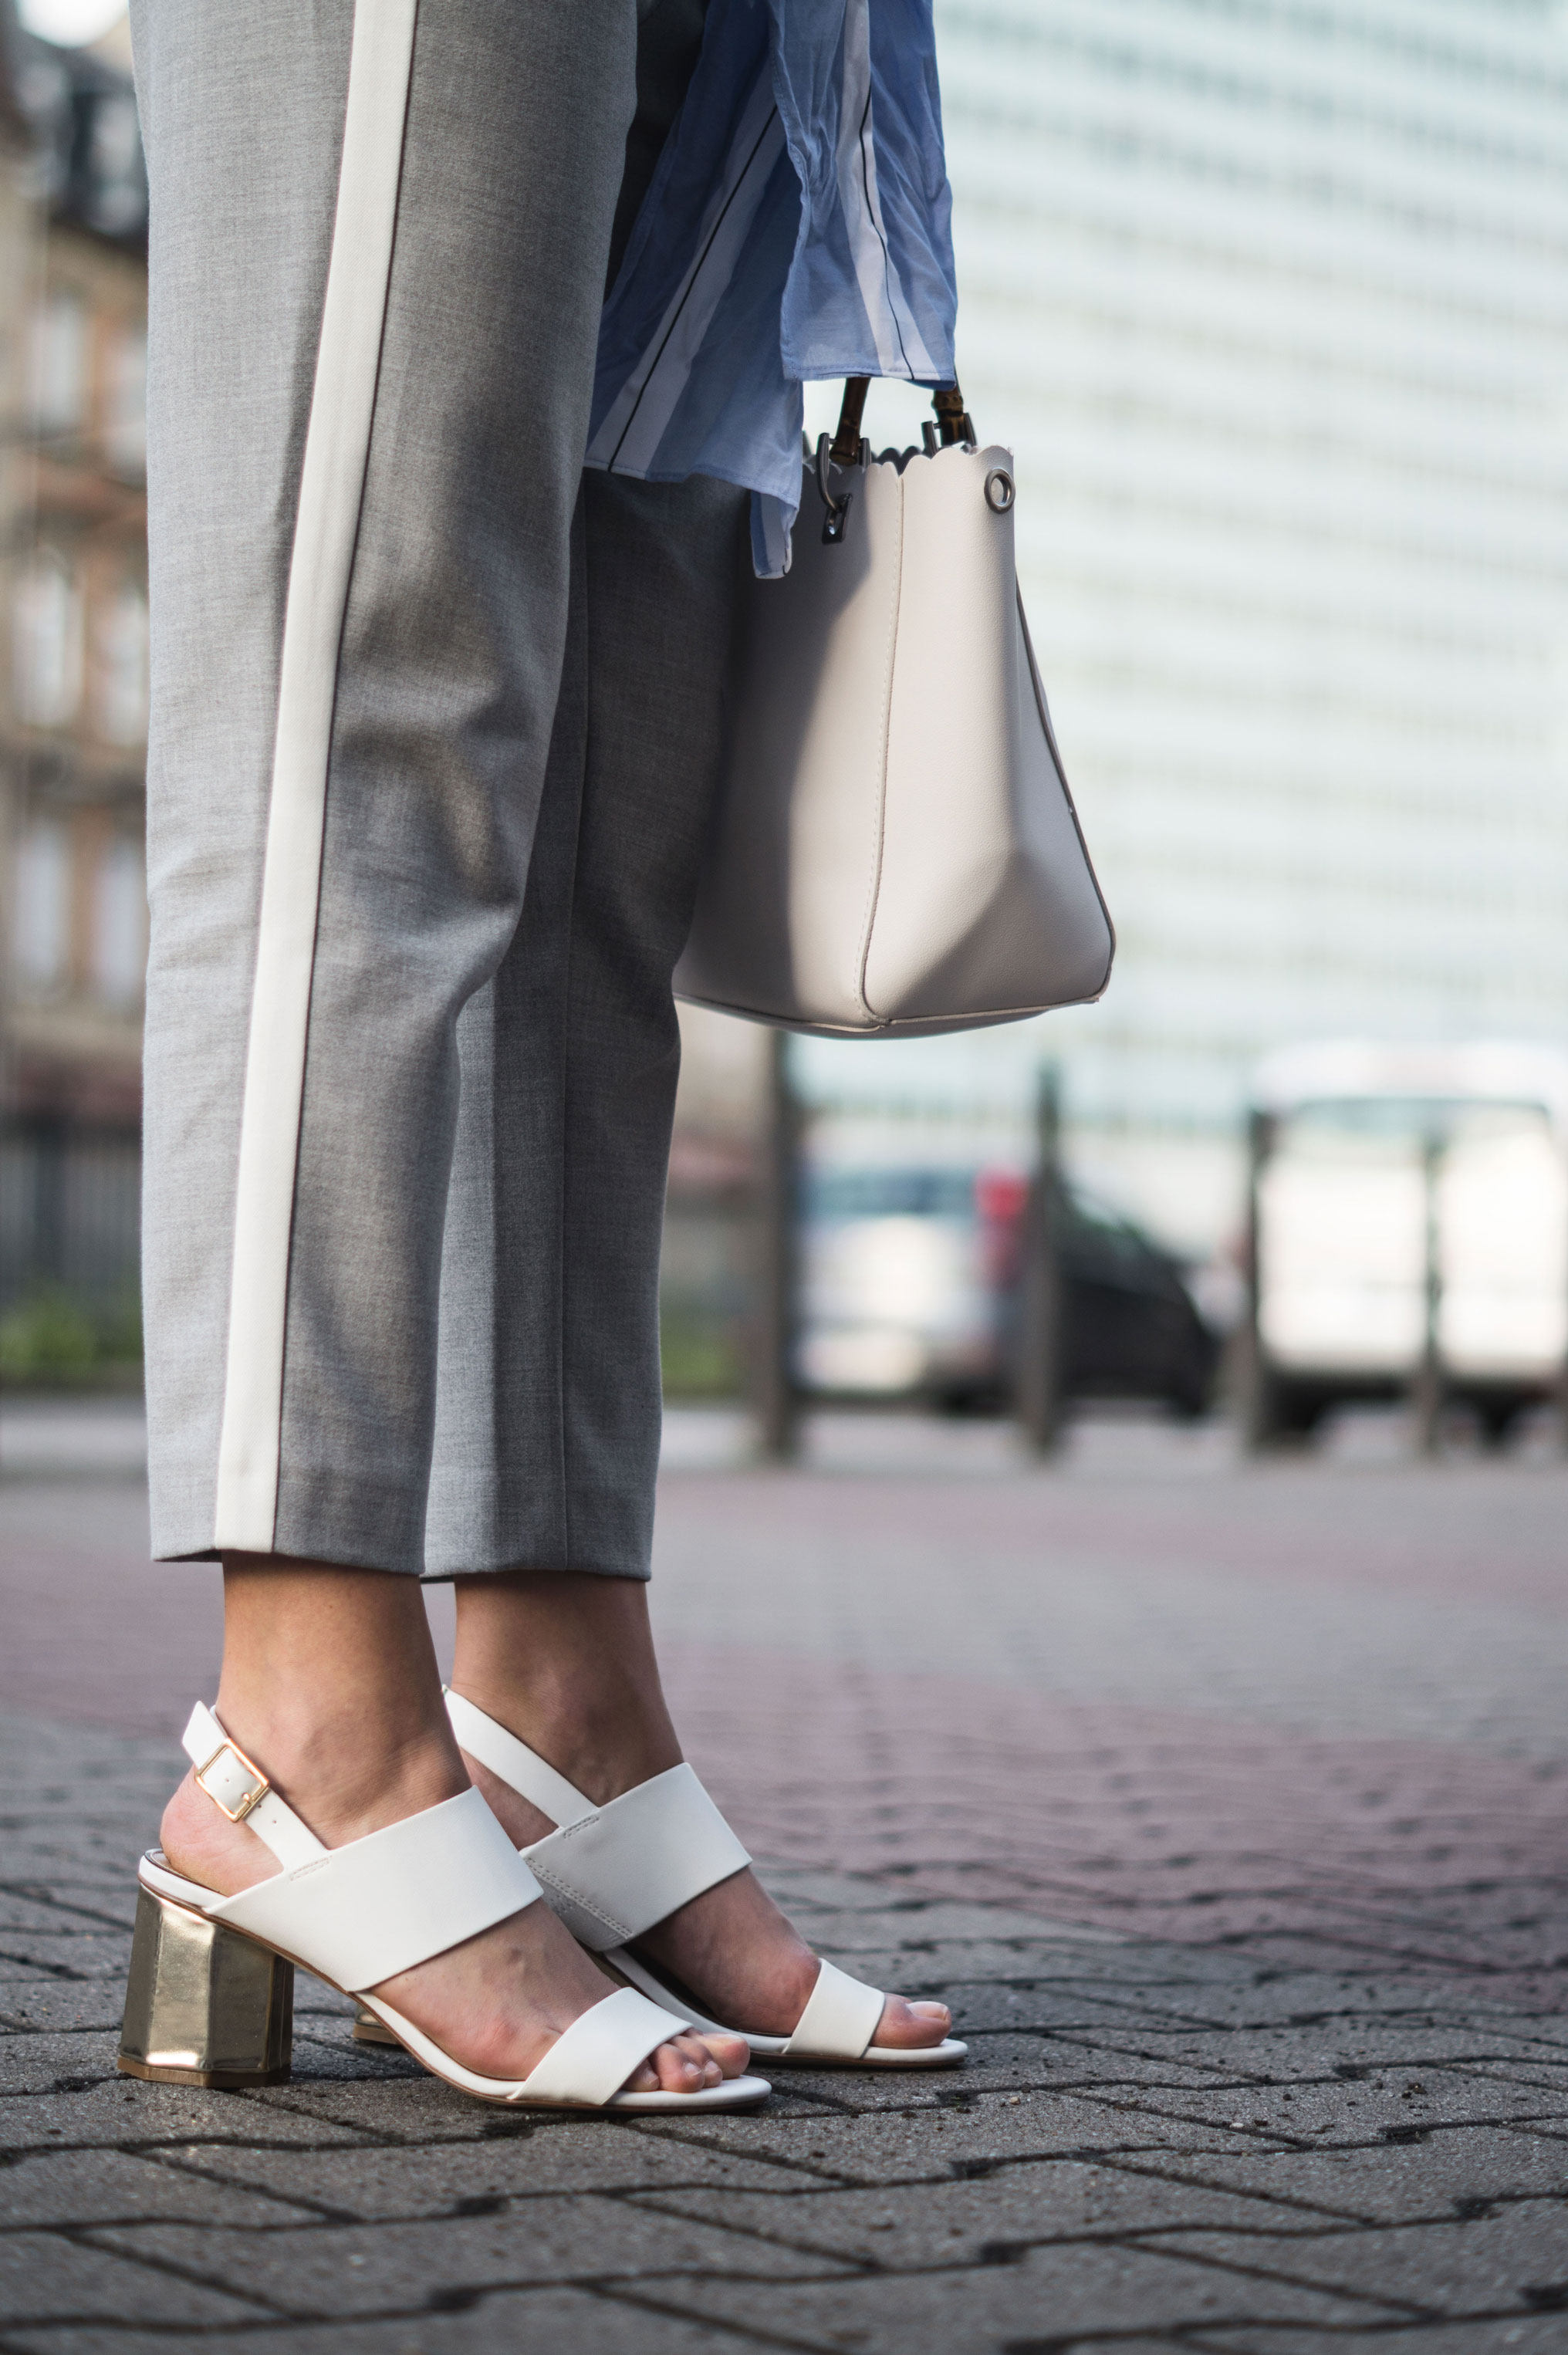 Mango-Wrap-Blouse-Knotenbluse-Joggers-Sariety-Fashionblogger-Modeblog-Heidelberg-Streetstyle-12